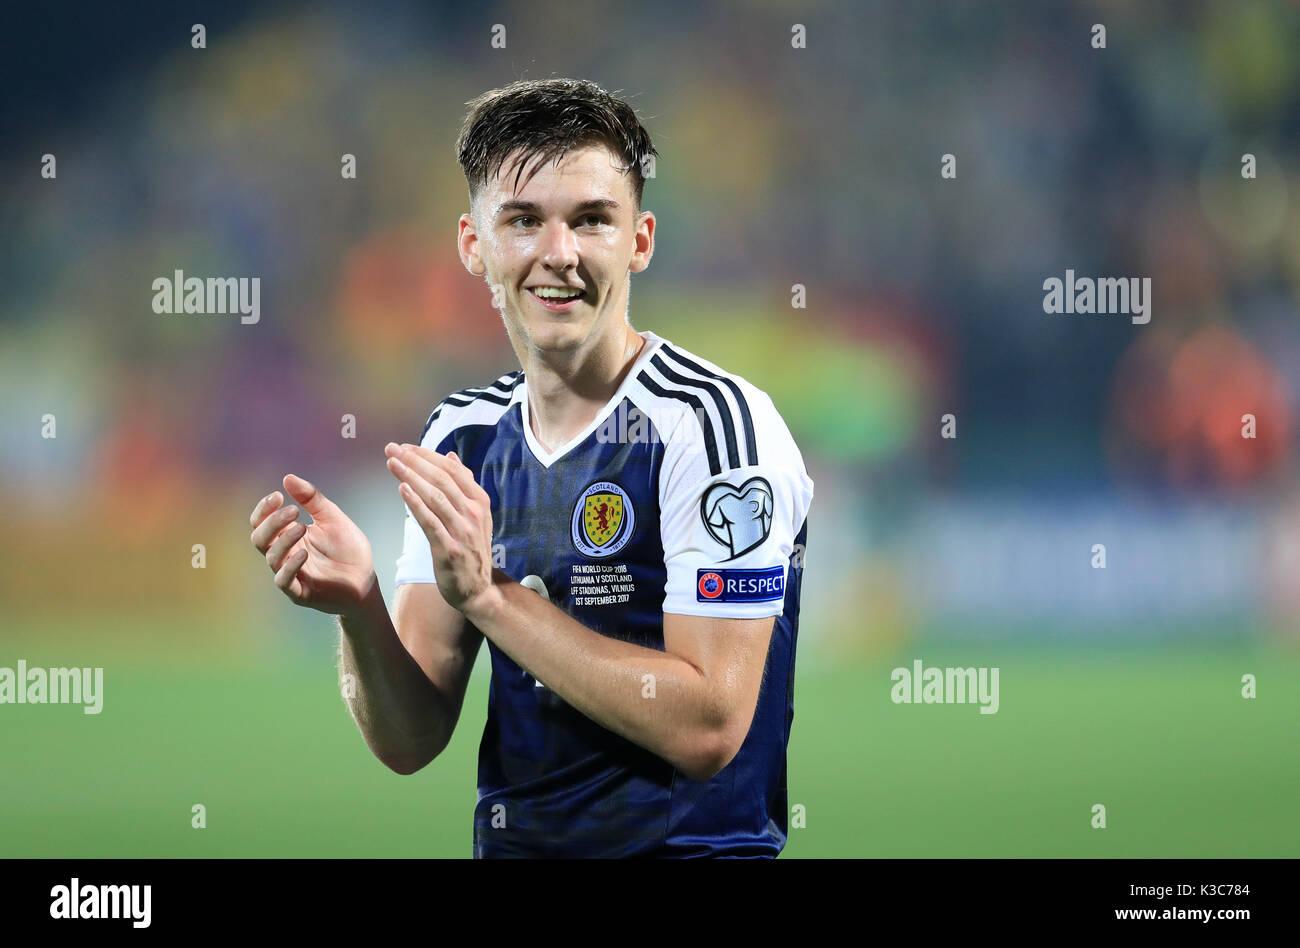 Scotland S Kieran Tierney During The 2018 Fifa World Cup Qualifying Group F Match At Lff Stadium Vilnius